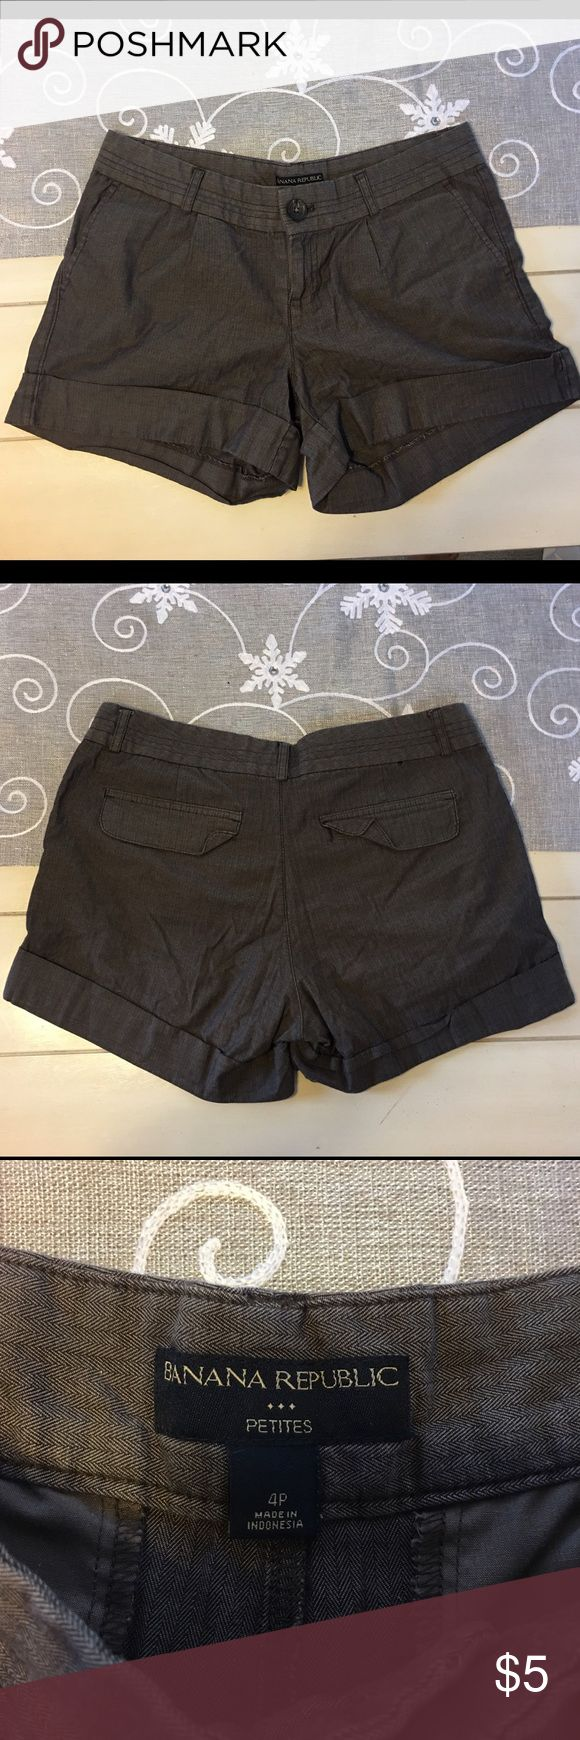 Banana republic shorts Good condition banana republic shorts 4p Banana Republic Shorts Skorts